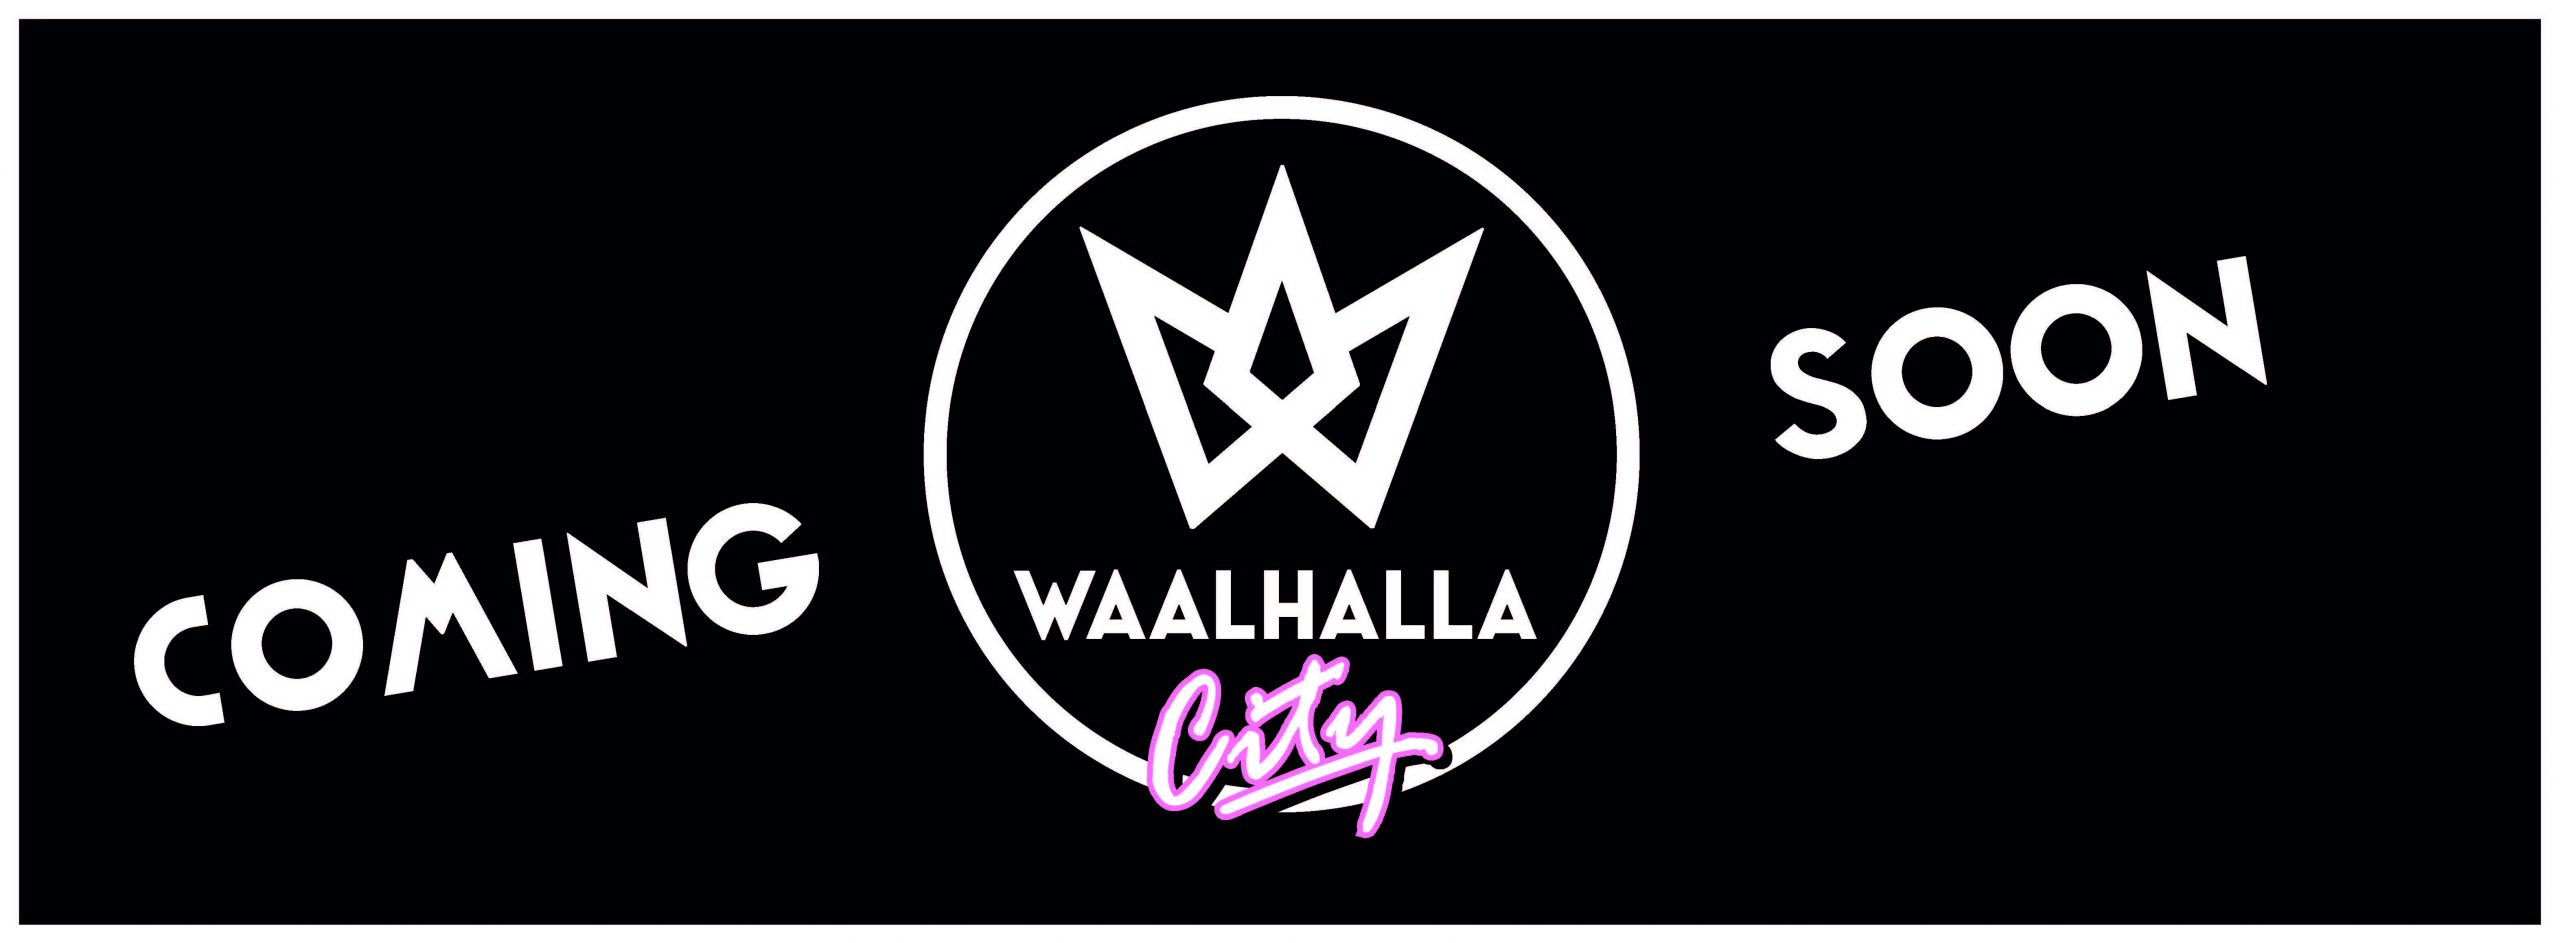 Waalhalla City